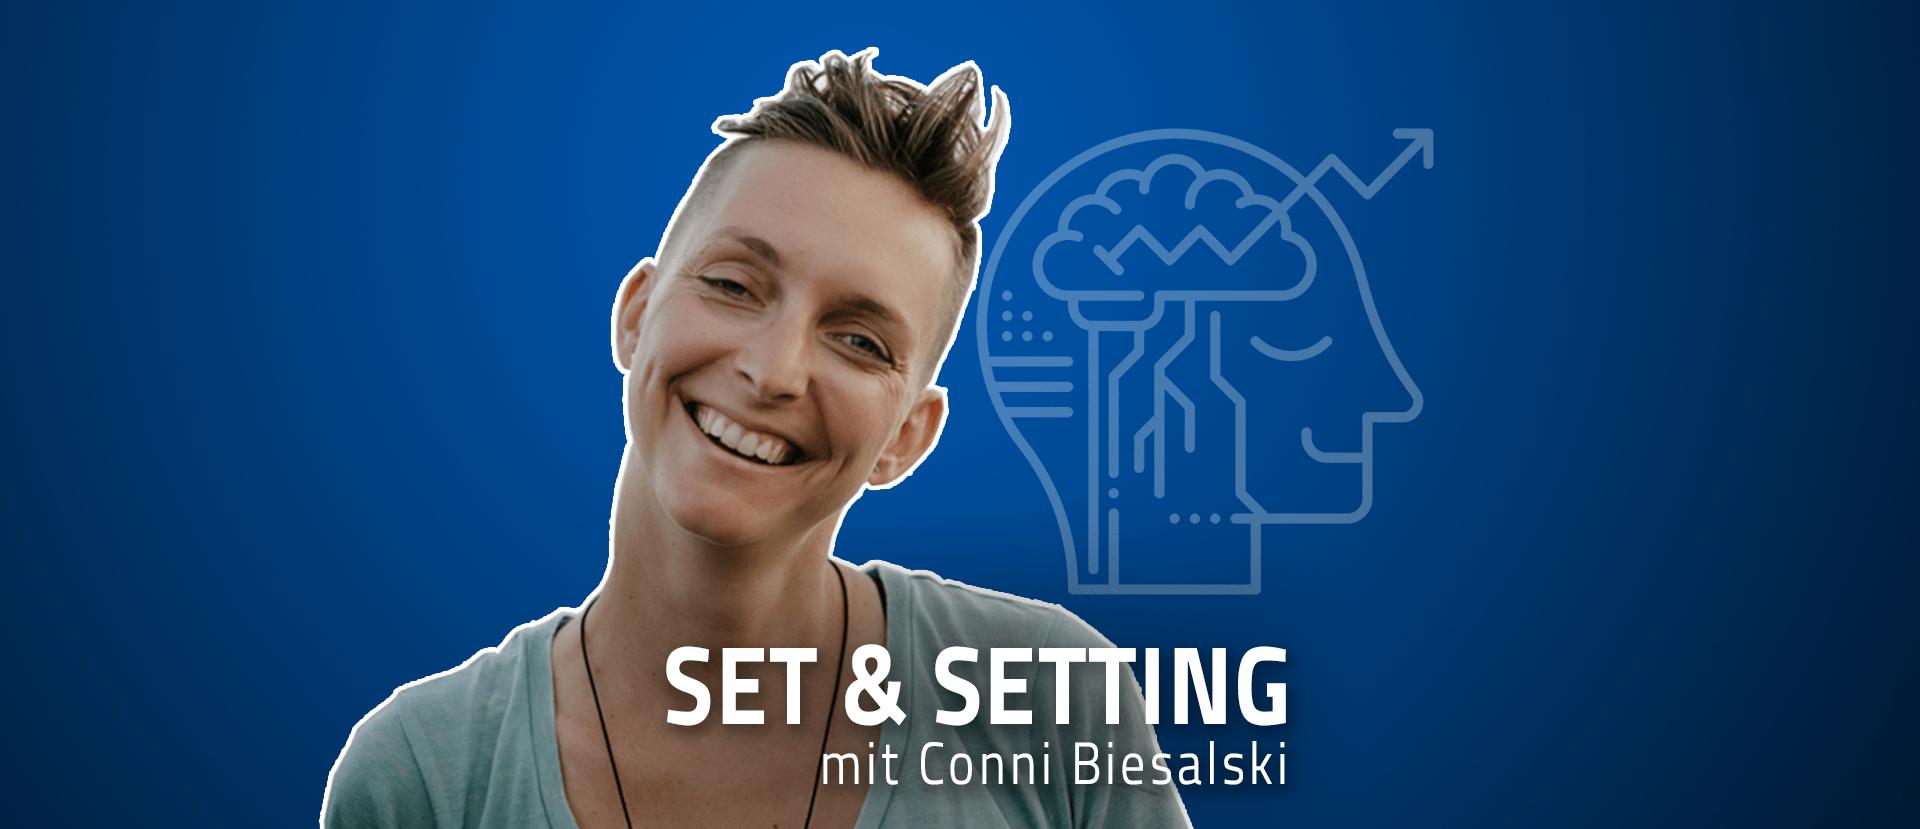 Connie Biesalski Psychedelika Jascha Renner Set Setting Atmen Breathwork